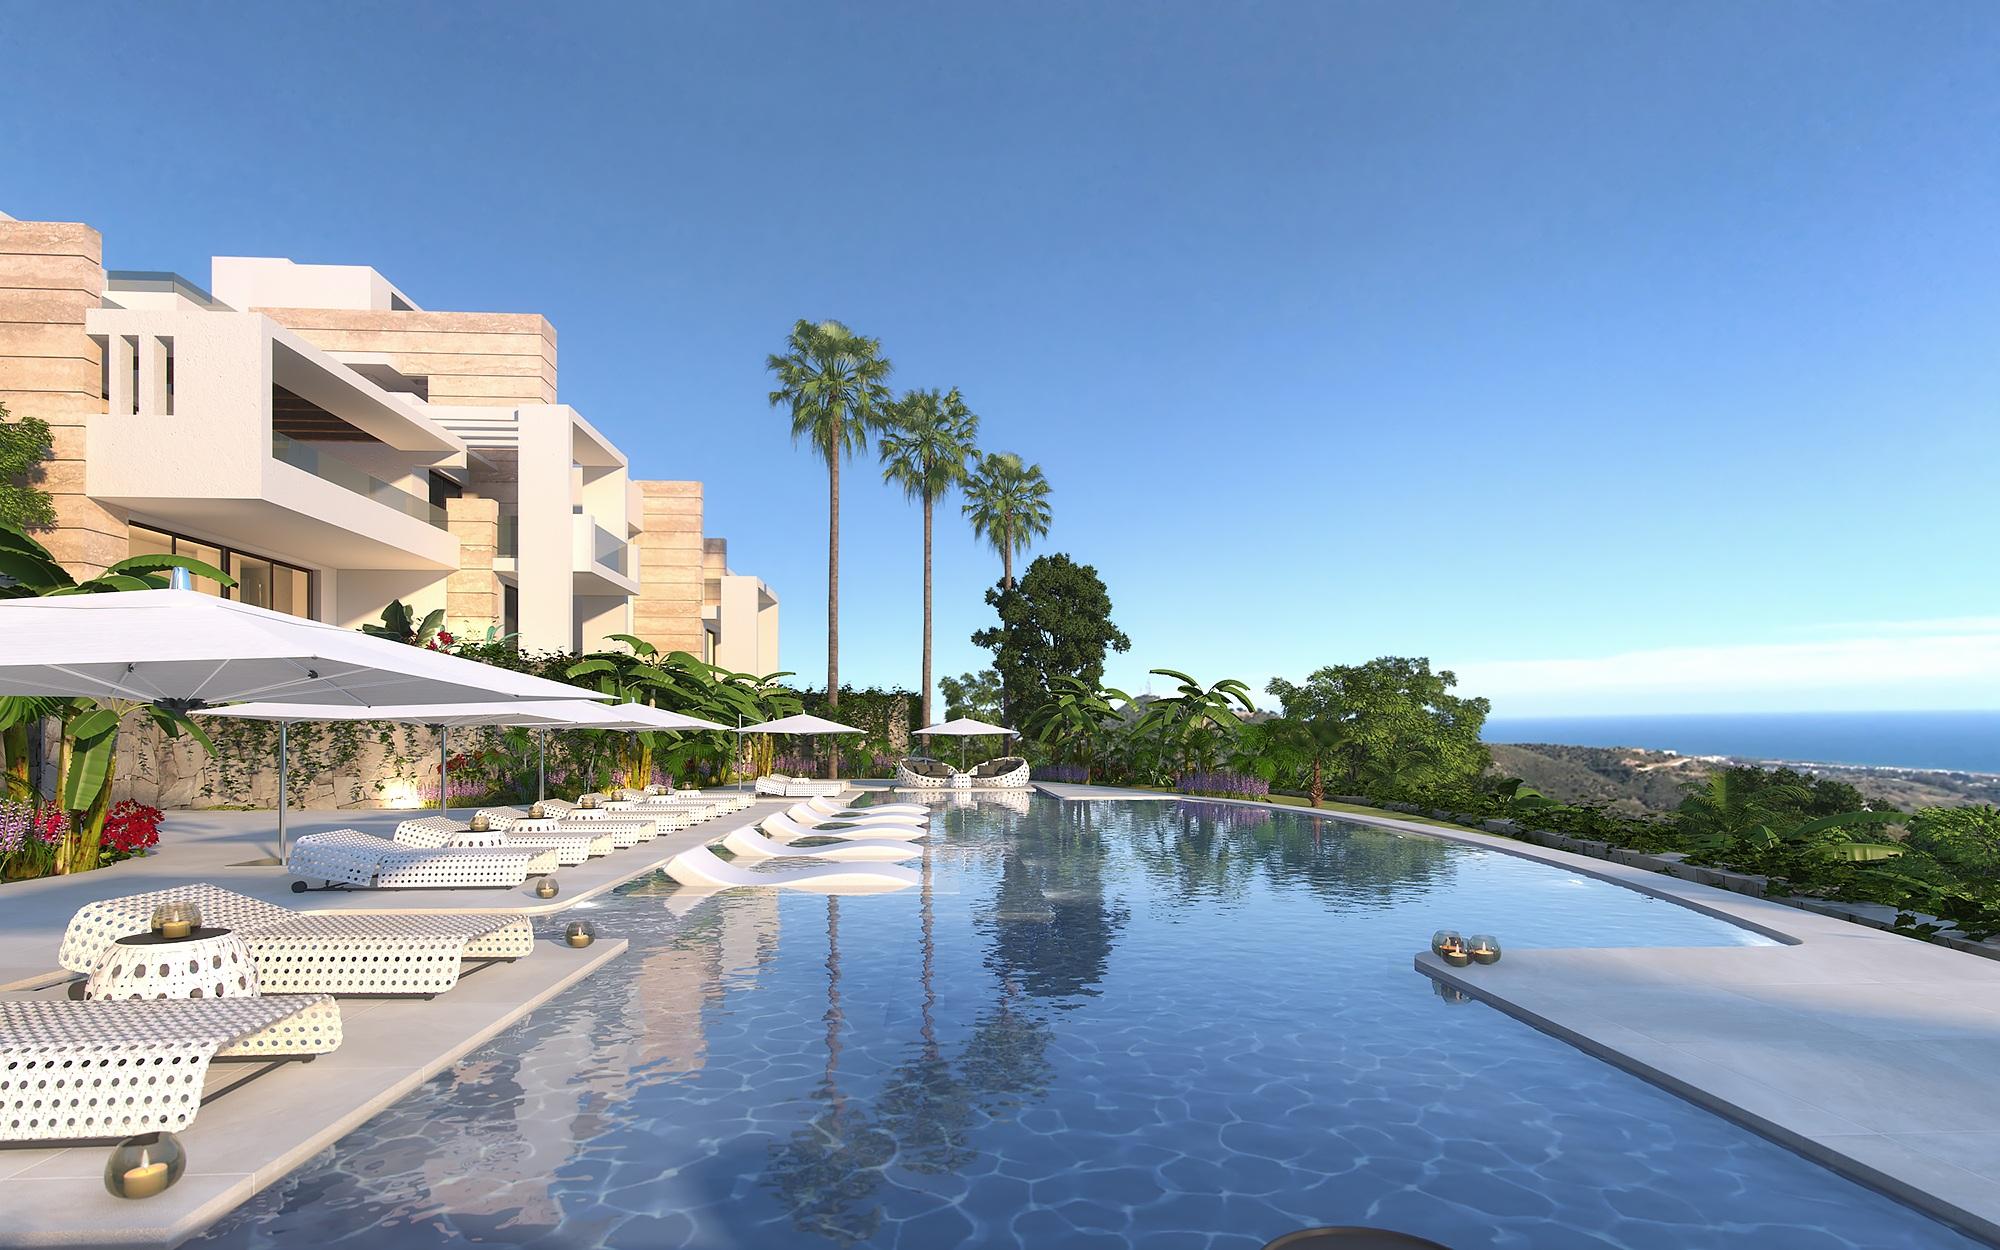 Investinspain Real Estate en Espagne